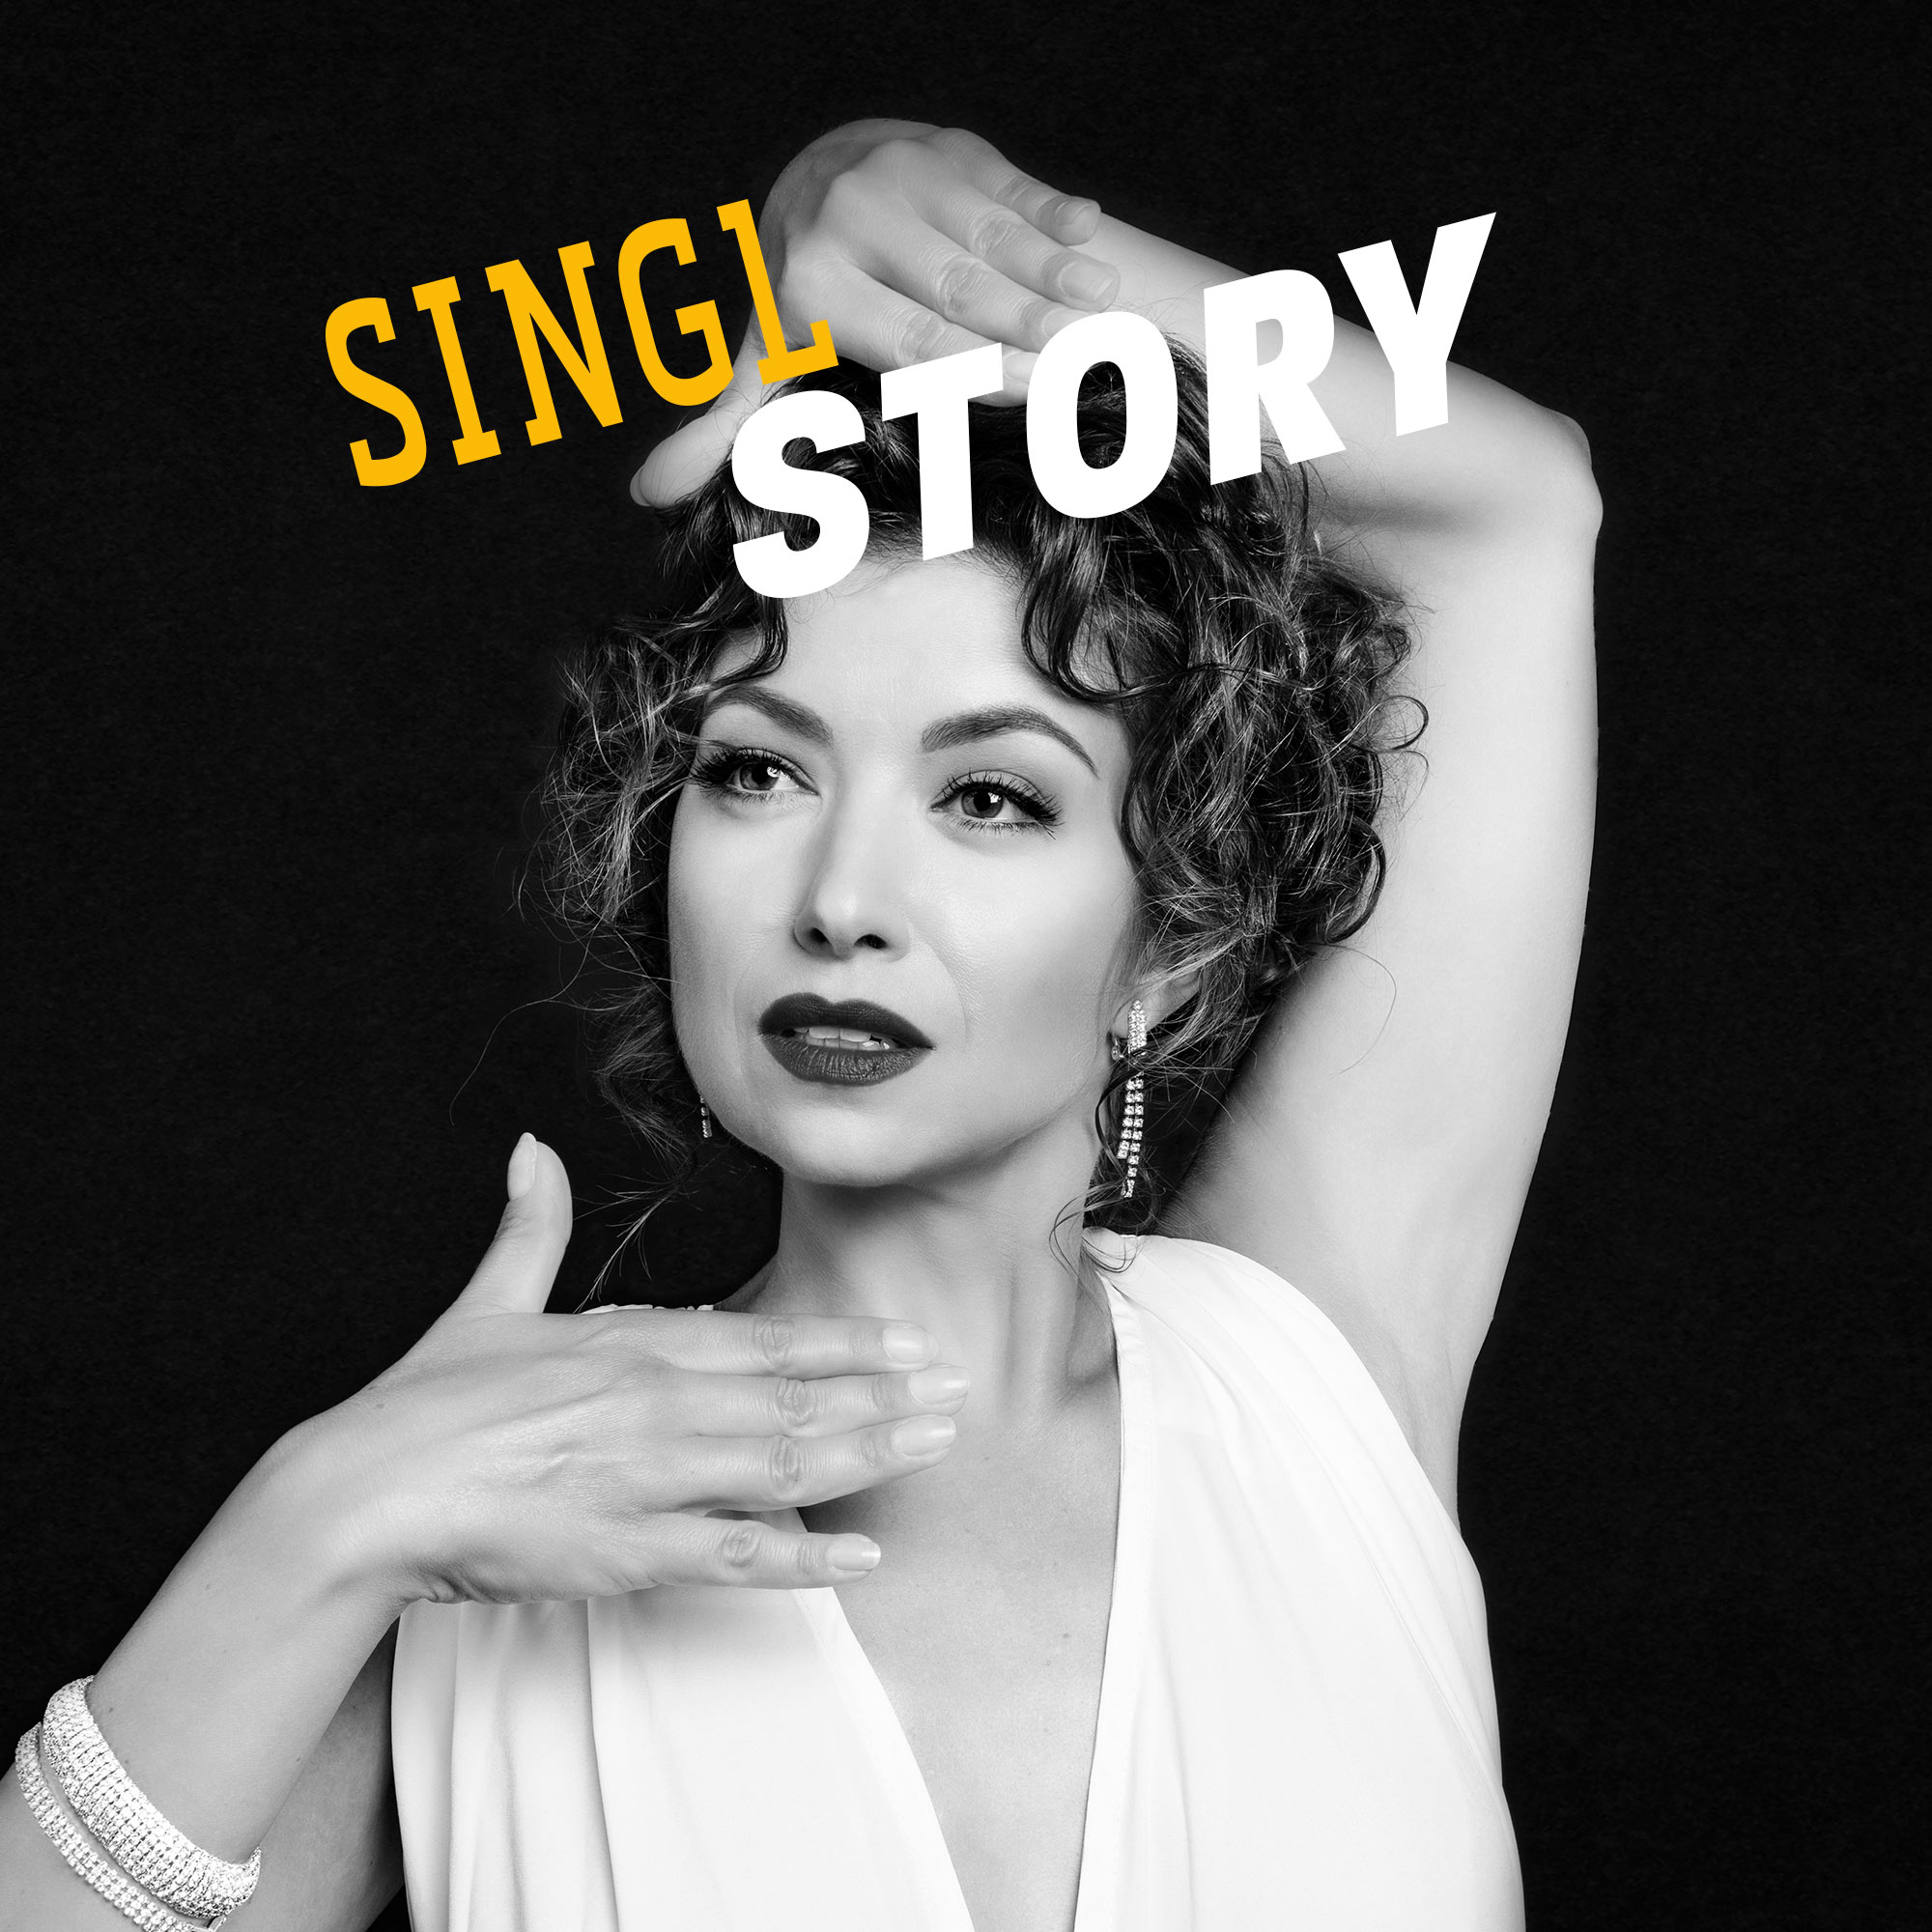 11. SinglStory